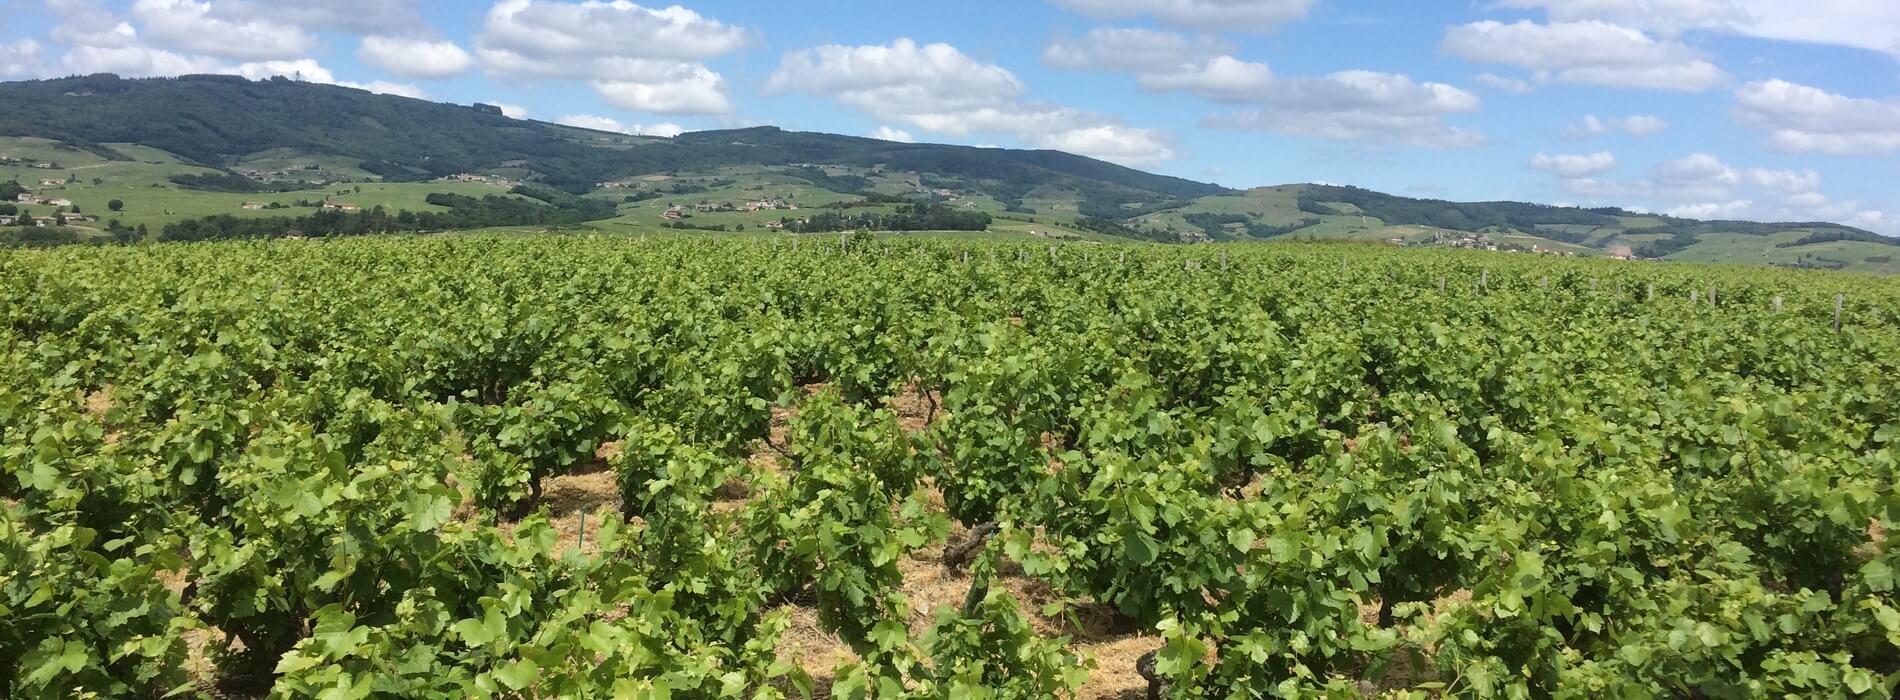 Kanpai Tourisme - Visits to Lyon Vineyards